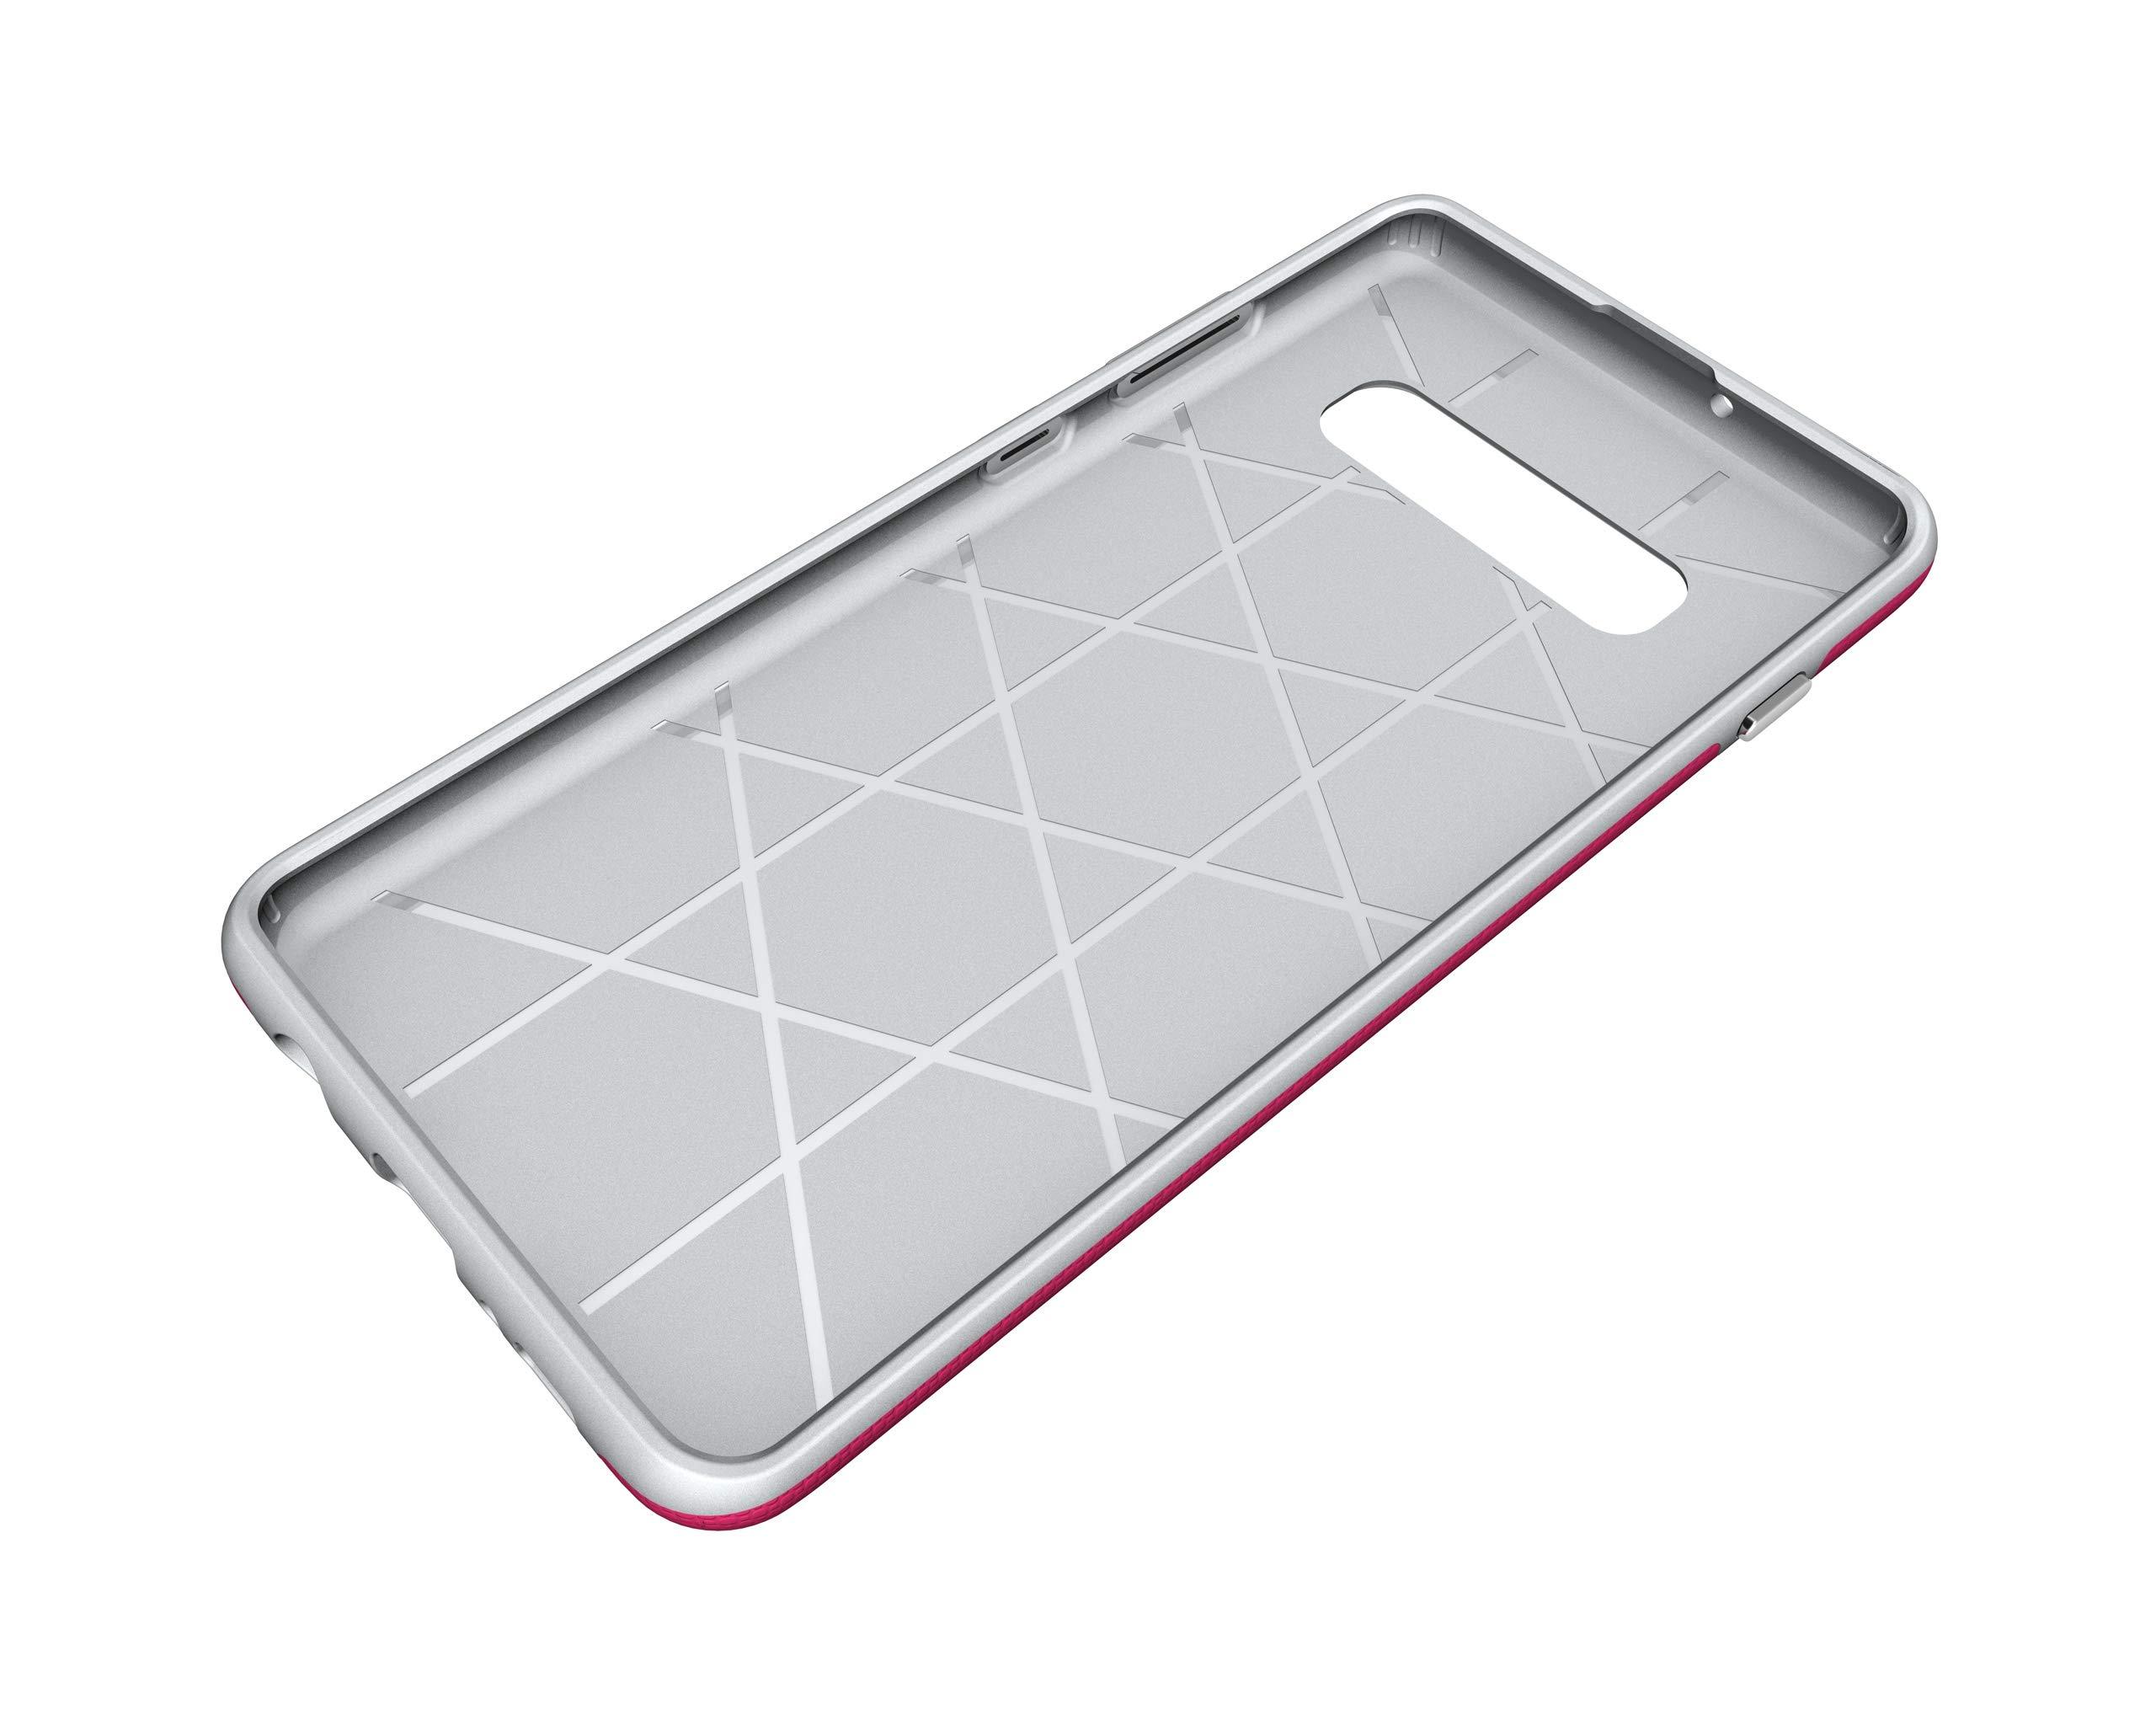 NOMO Galaxy S10 Case,Samsung S10 Hybrid Defender Armor Case,Dual Layer Protective Phone Case,Full Body Rugged Case,Non-Slip Drop Protection Shock Proof Case for Samsung Galaxy S10 Hot Pink by NOMO (Image #6)